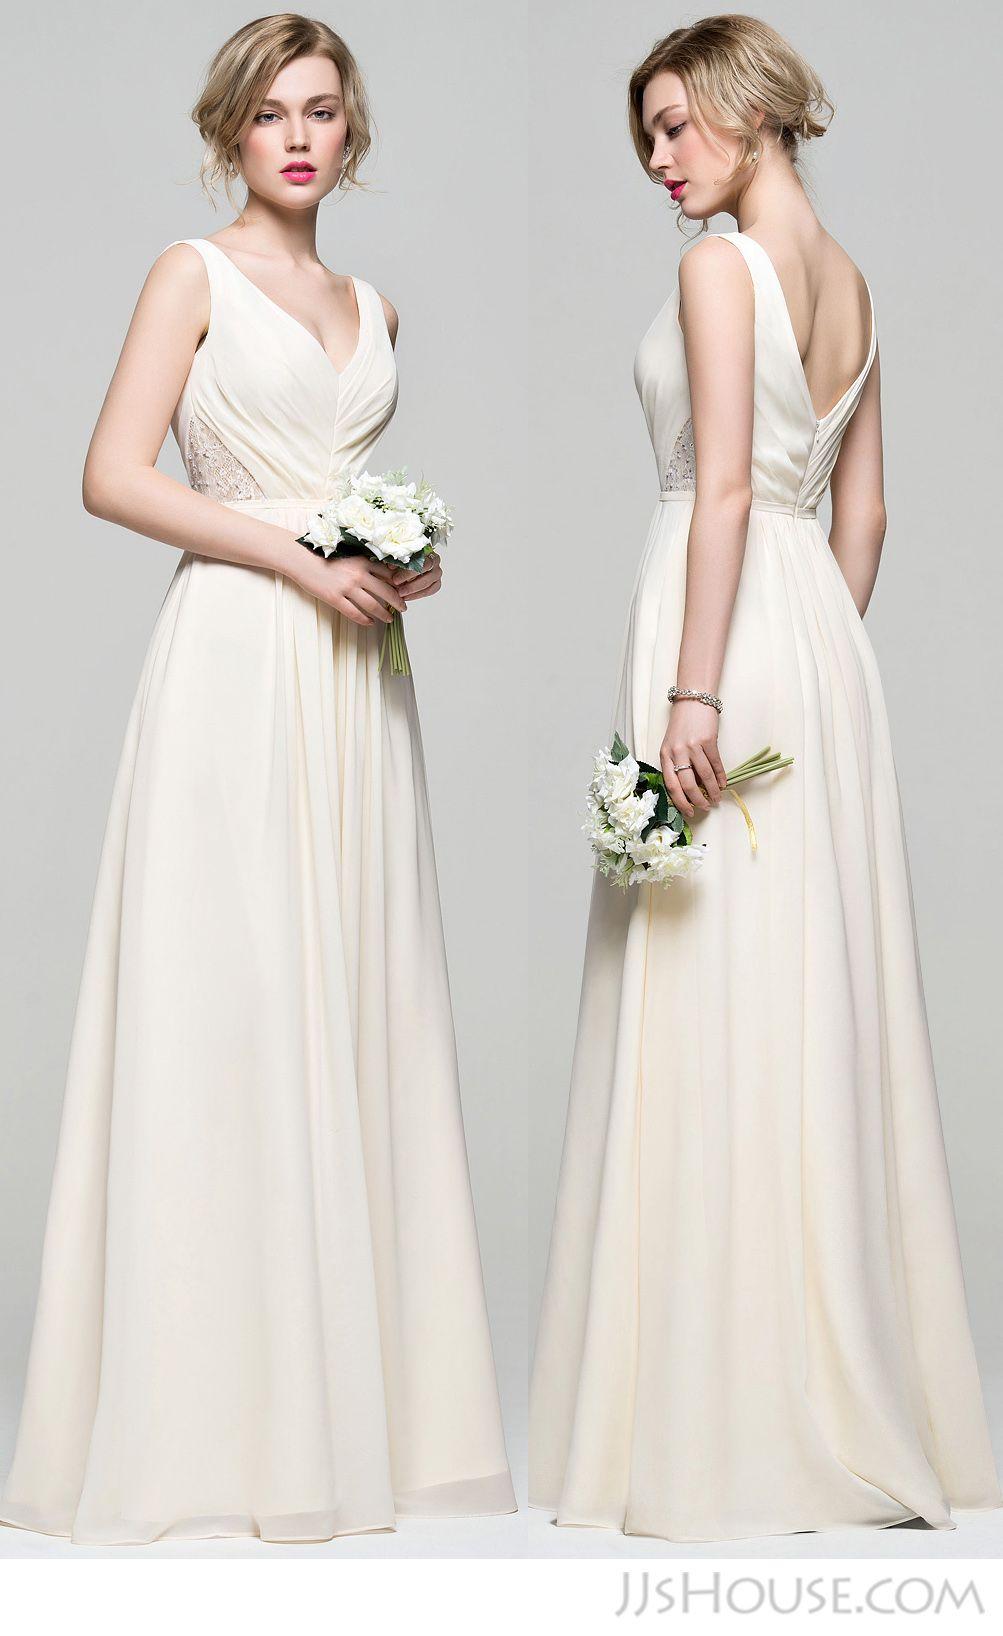 Hope Your S Will Like The V Neck Bridesmaid Dress Jjshouse Jjshousebridesmaiddress